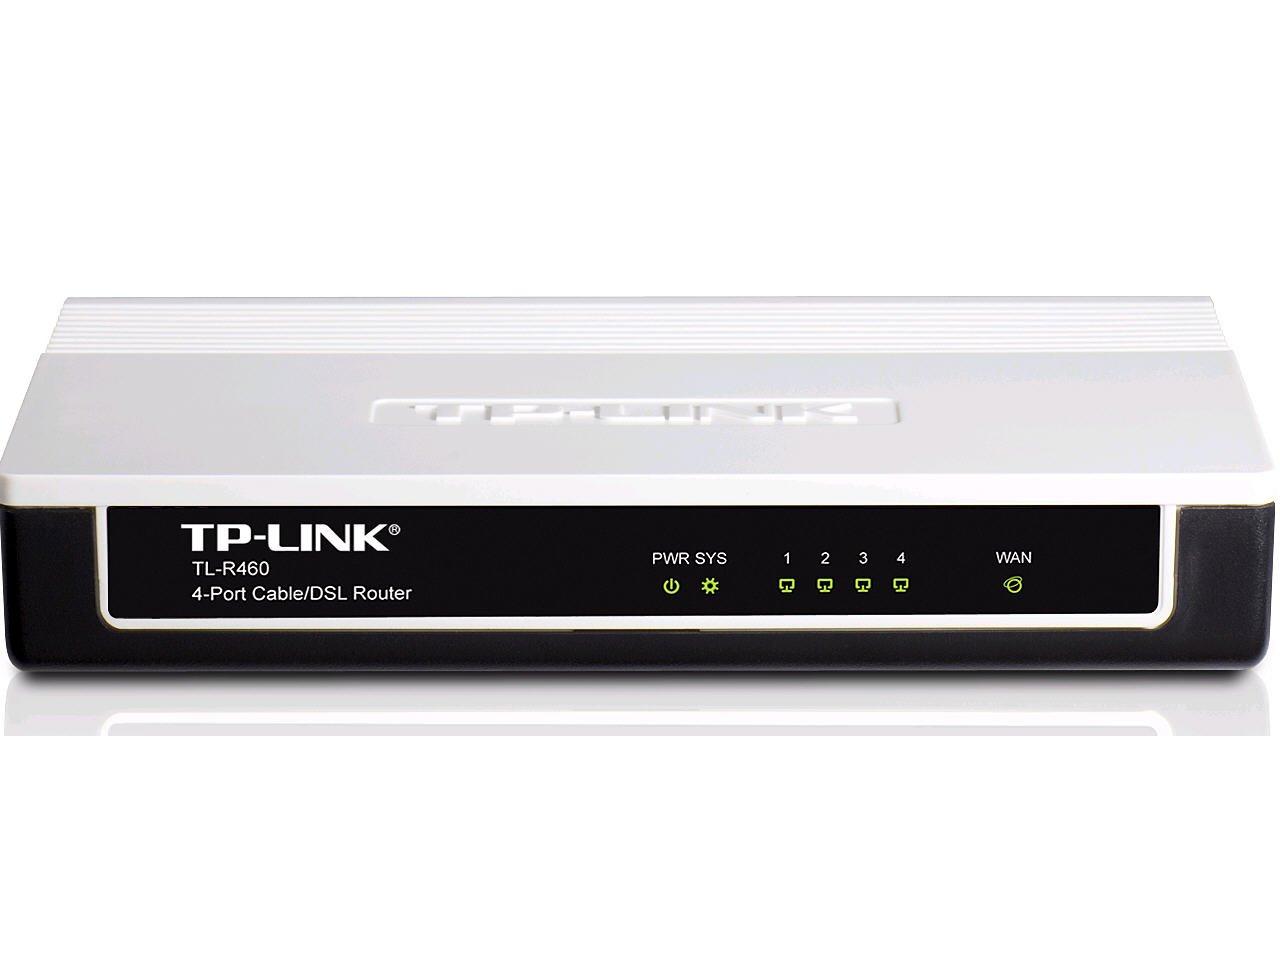 TP-Link TL-R460 v4 Router X64 Driver Download